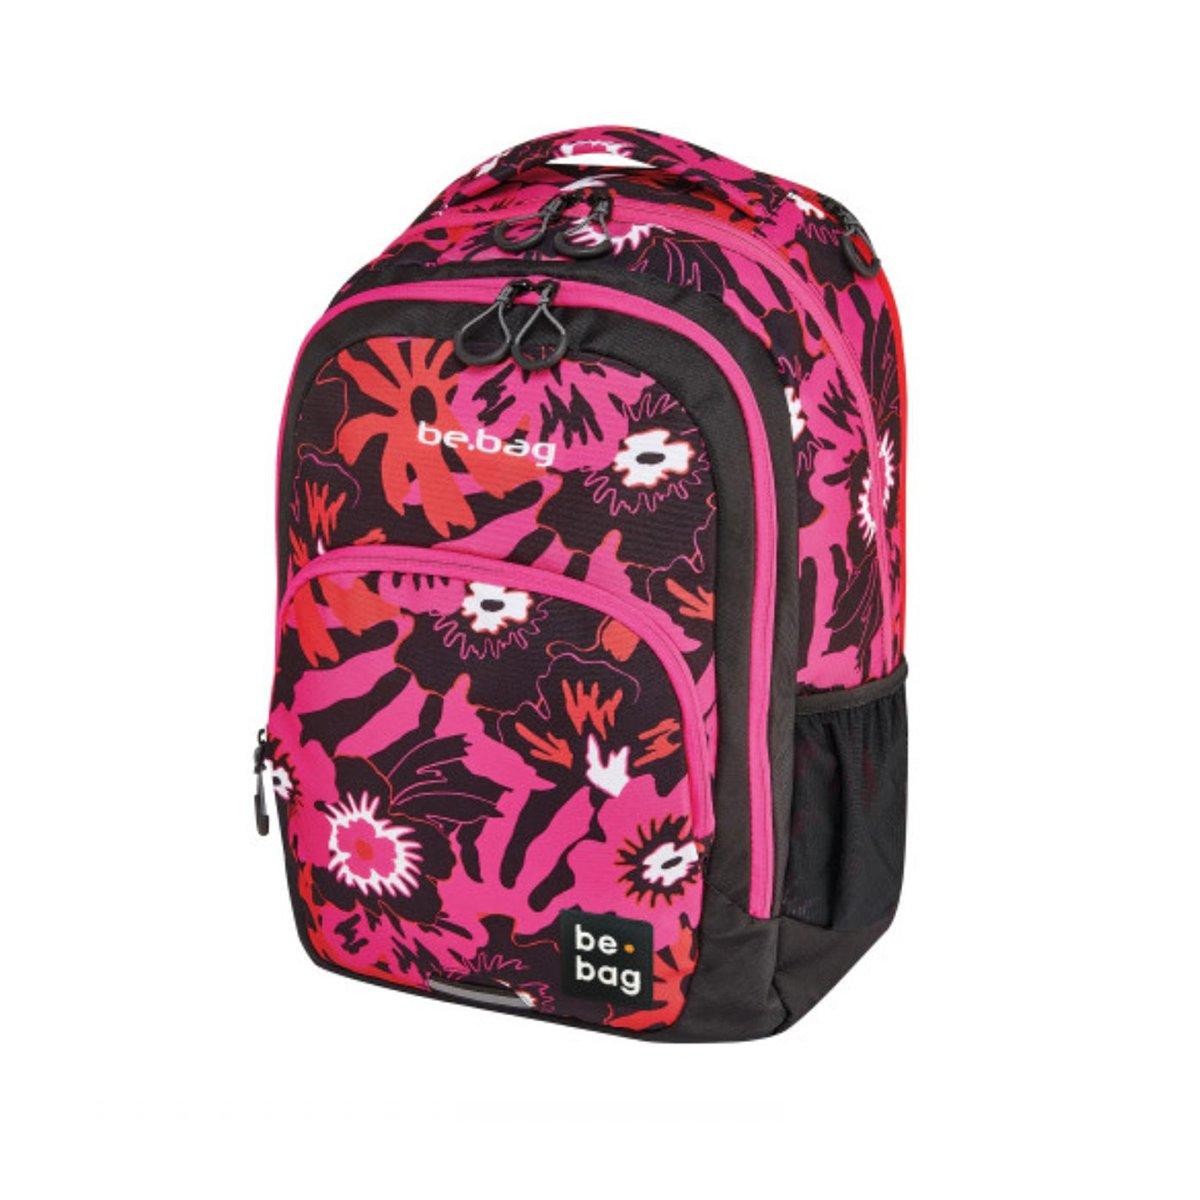 Rucsac Herlitz Be Bag Be Ready Pink Summer +